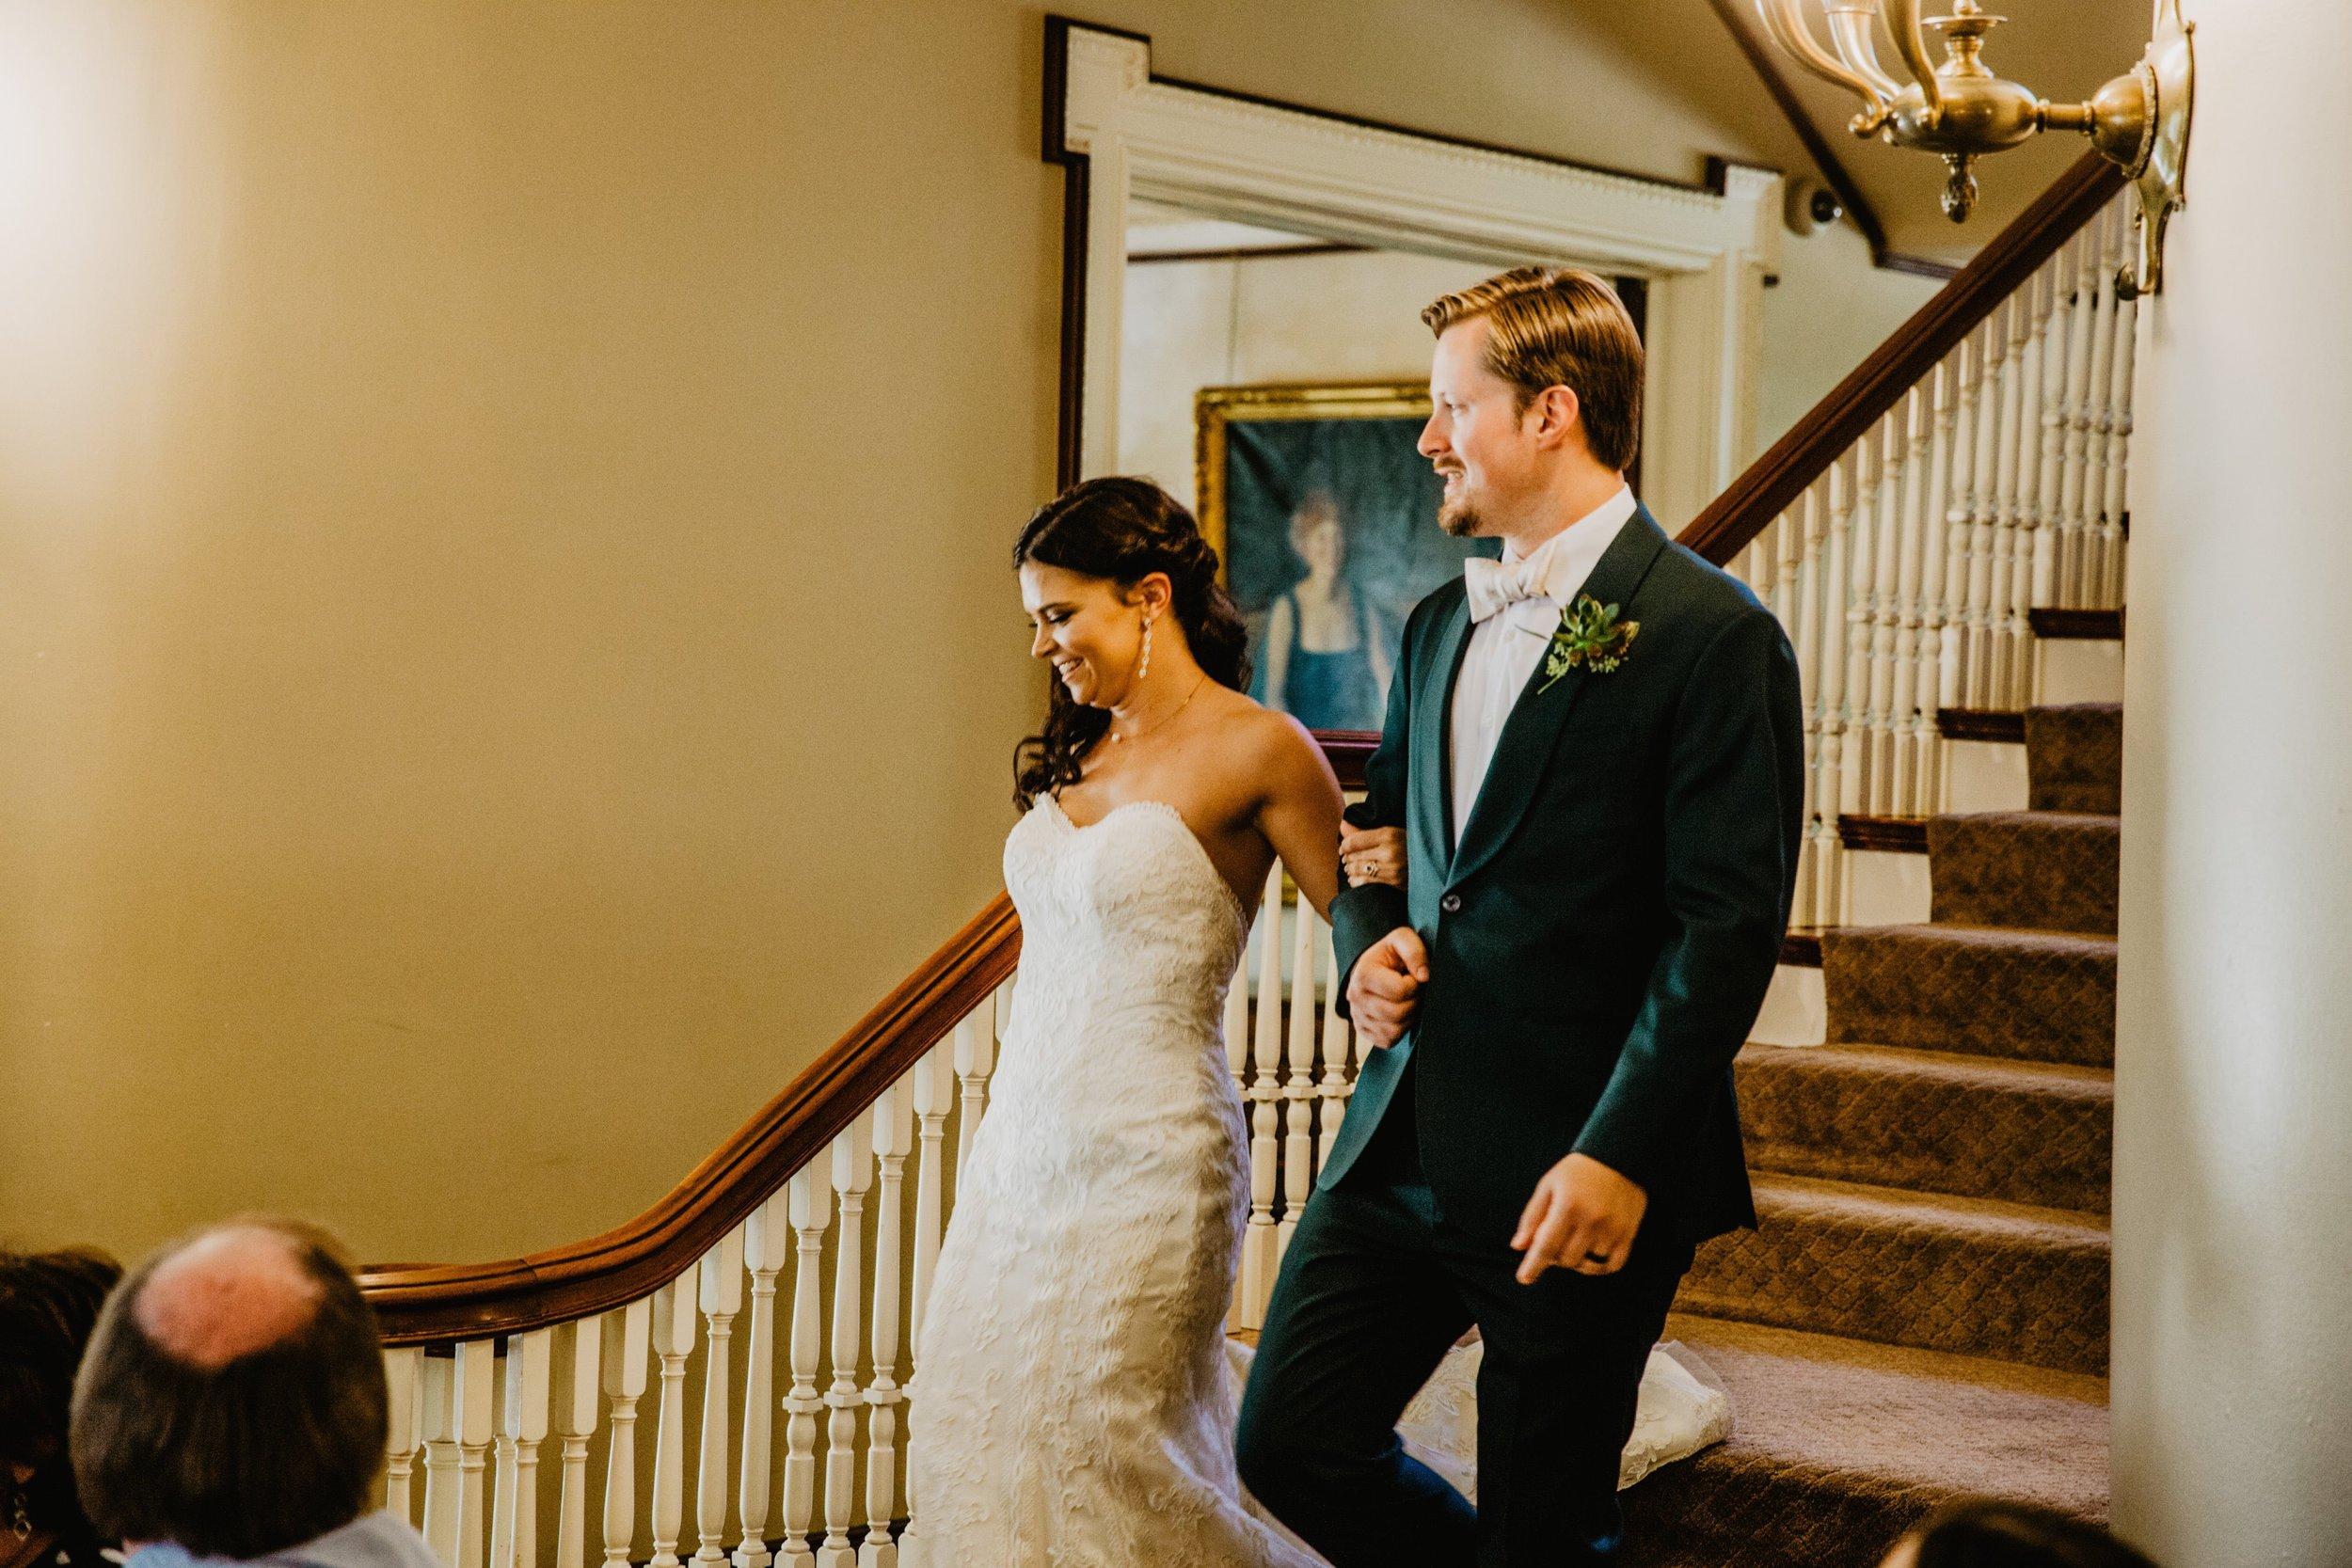 Kisa Conrad Favorites-0073-colorado-wedding-photographer-denver-springs-vail.jpeg